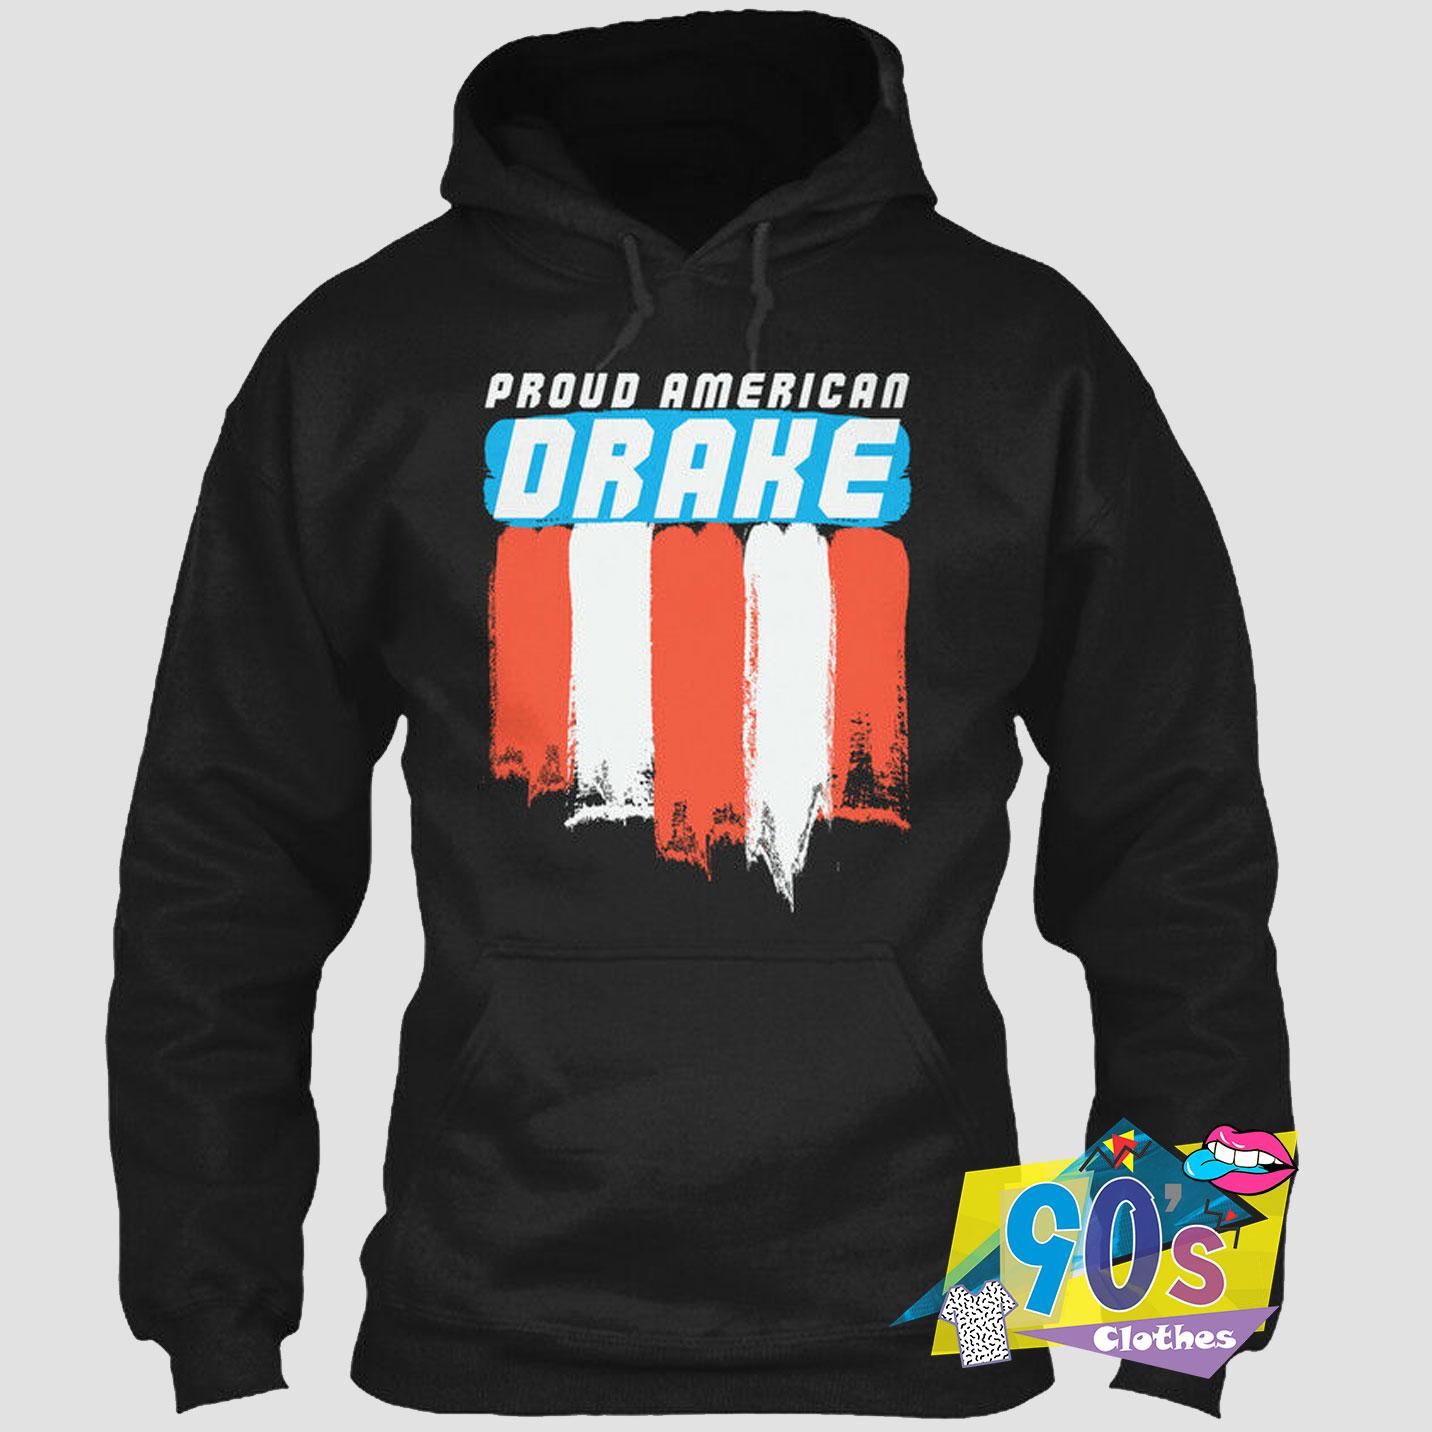 sale proud clothing